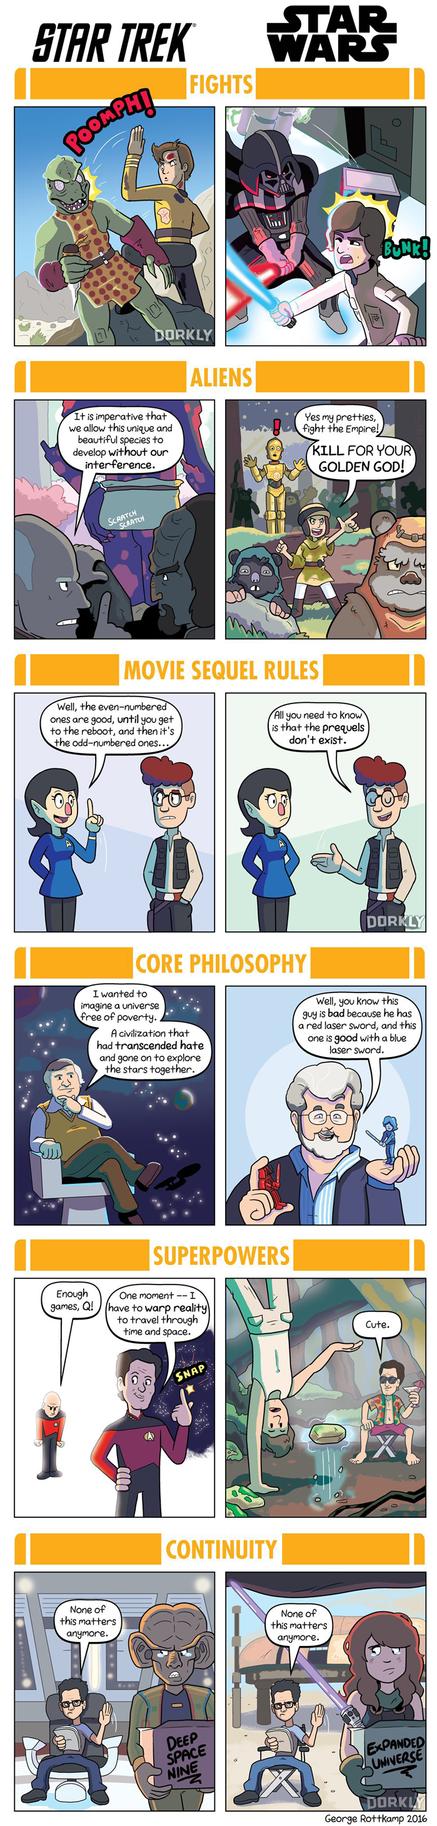 DORKLY: Star Trek vs. Star Wars by GeorgeRottkamp